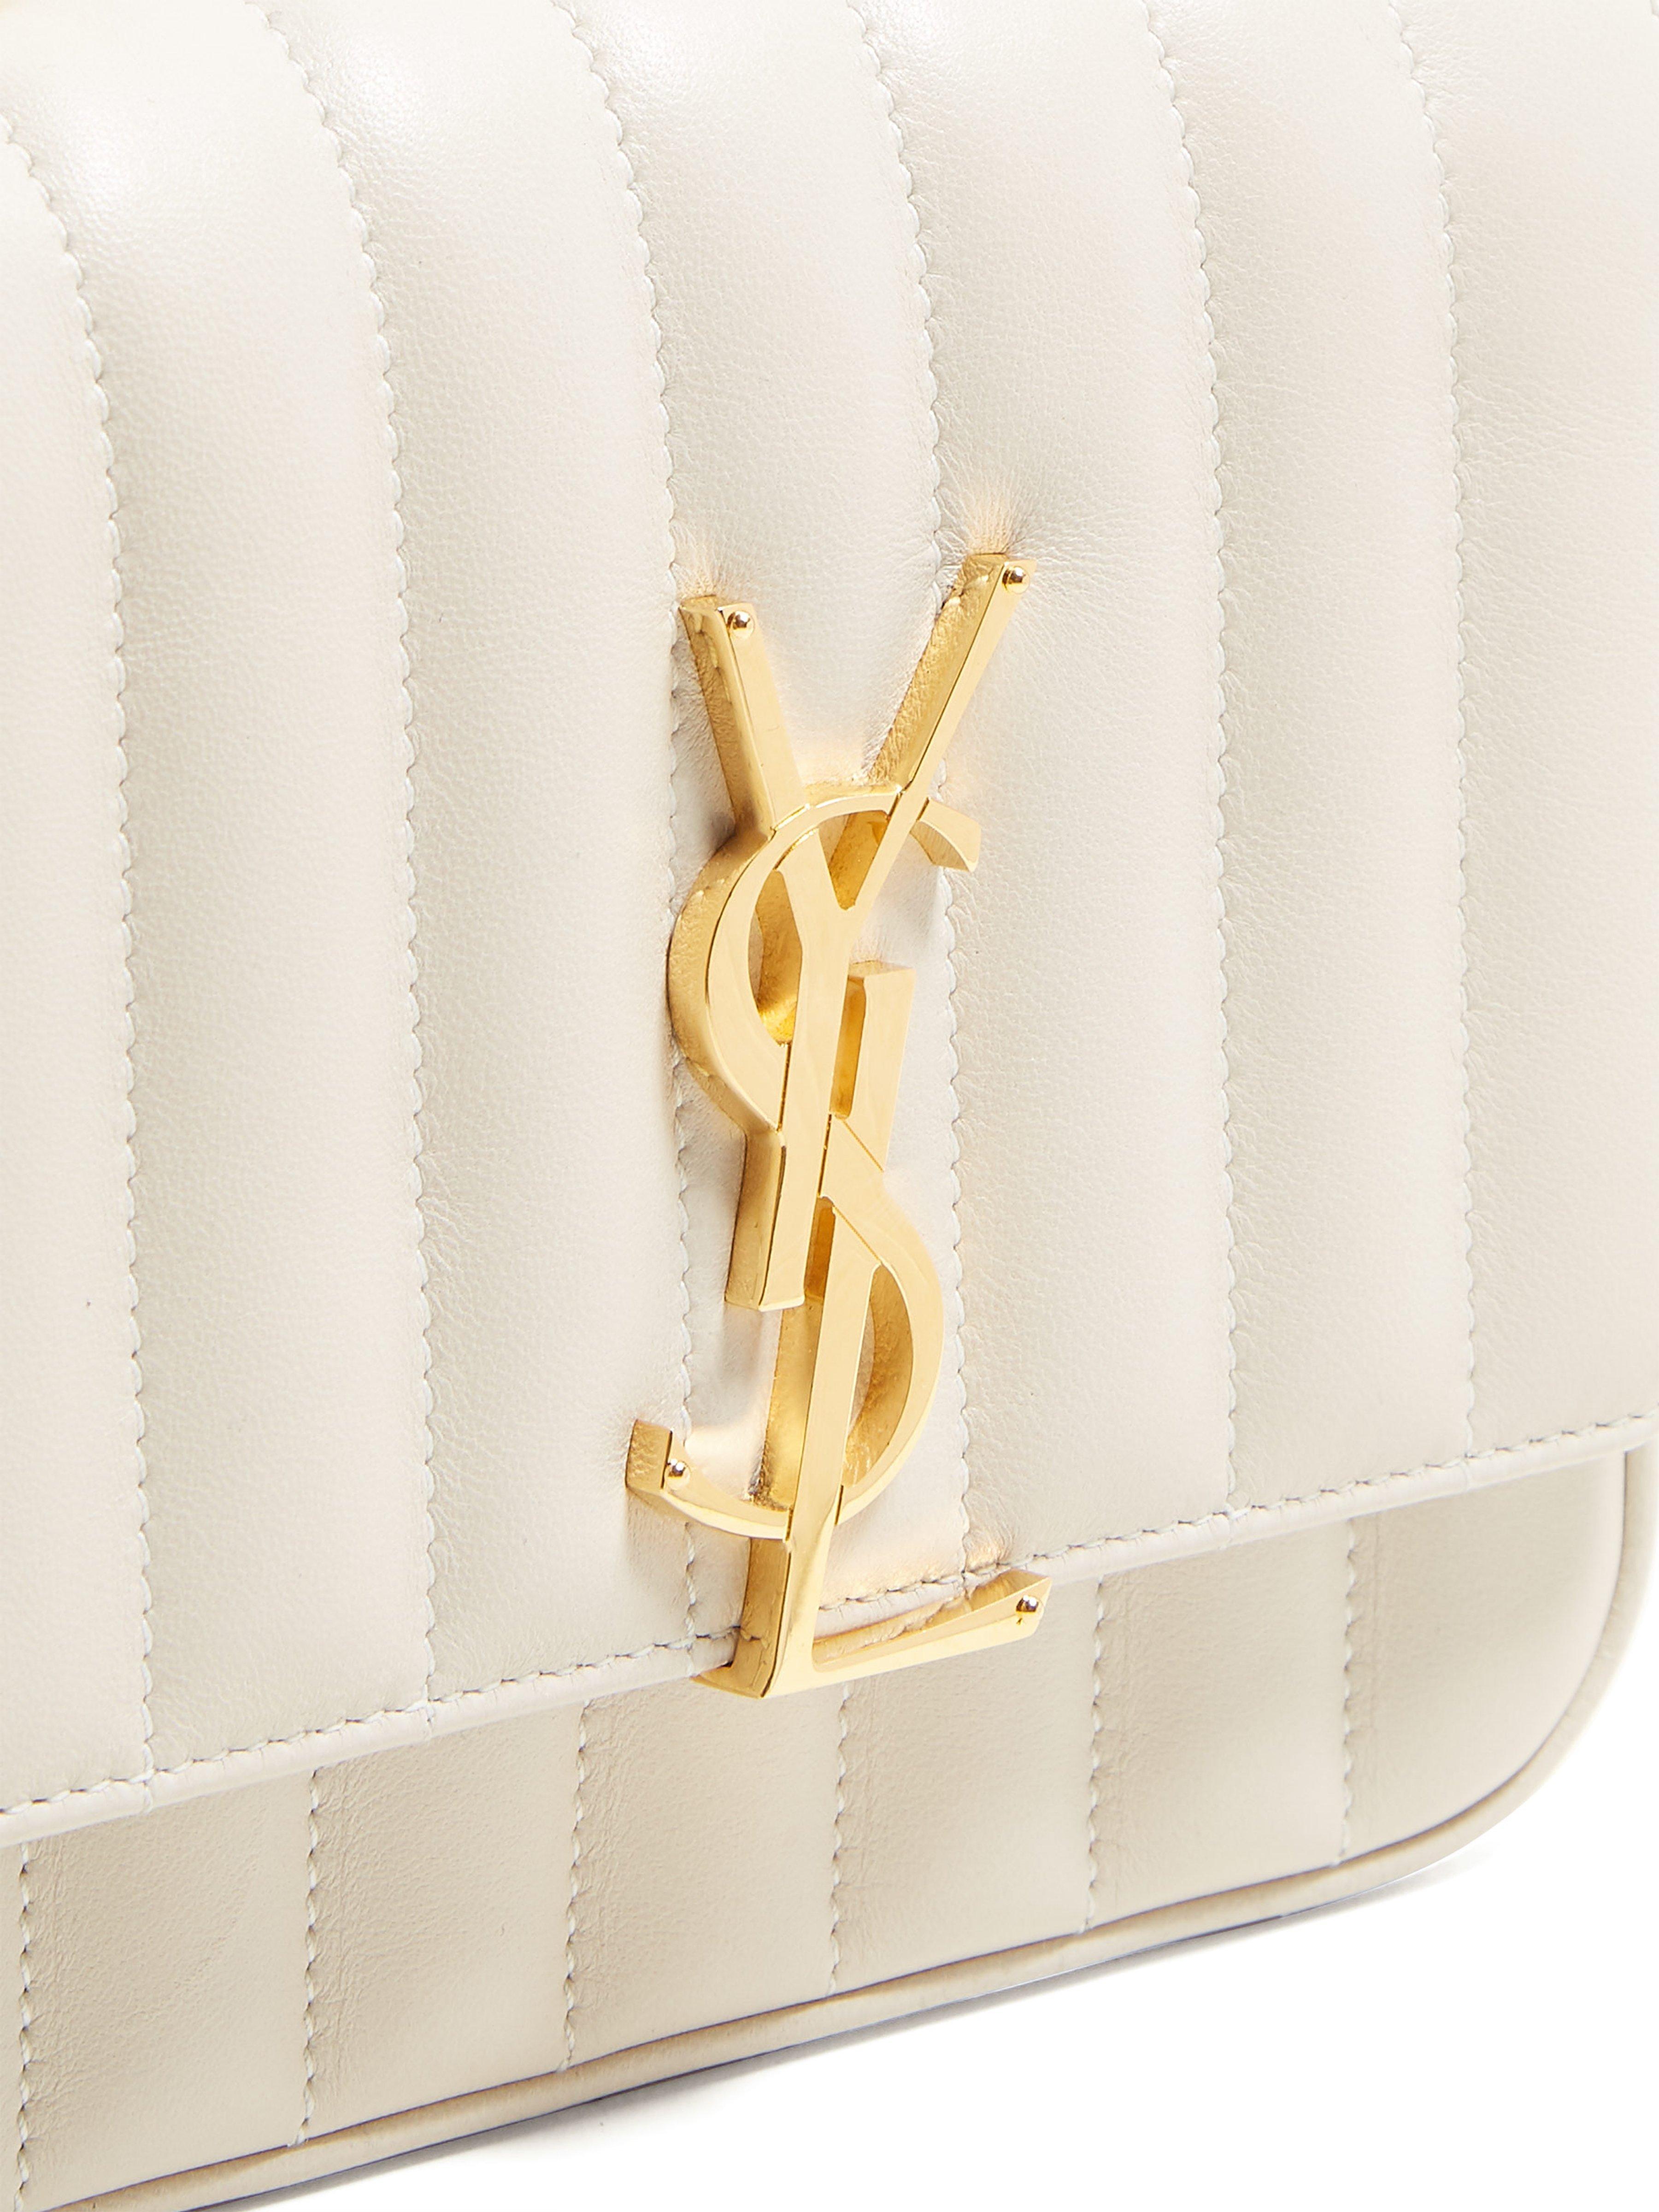 46274538d8b3 Saint Laurent - White Vicky Small Leather Bag - Lyst. View fullscreen